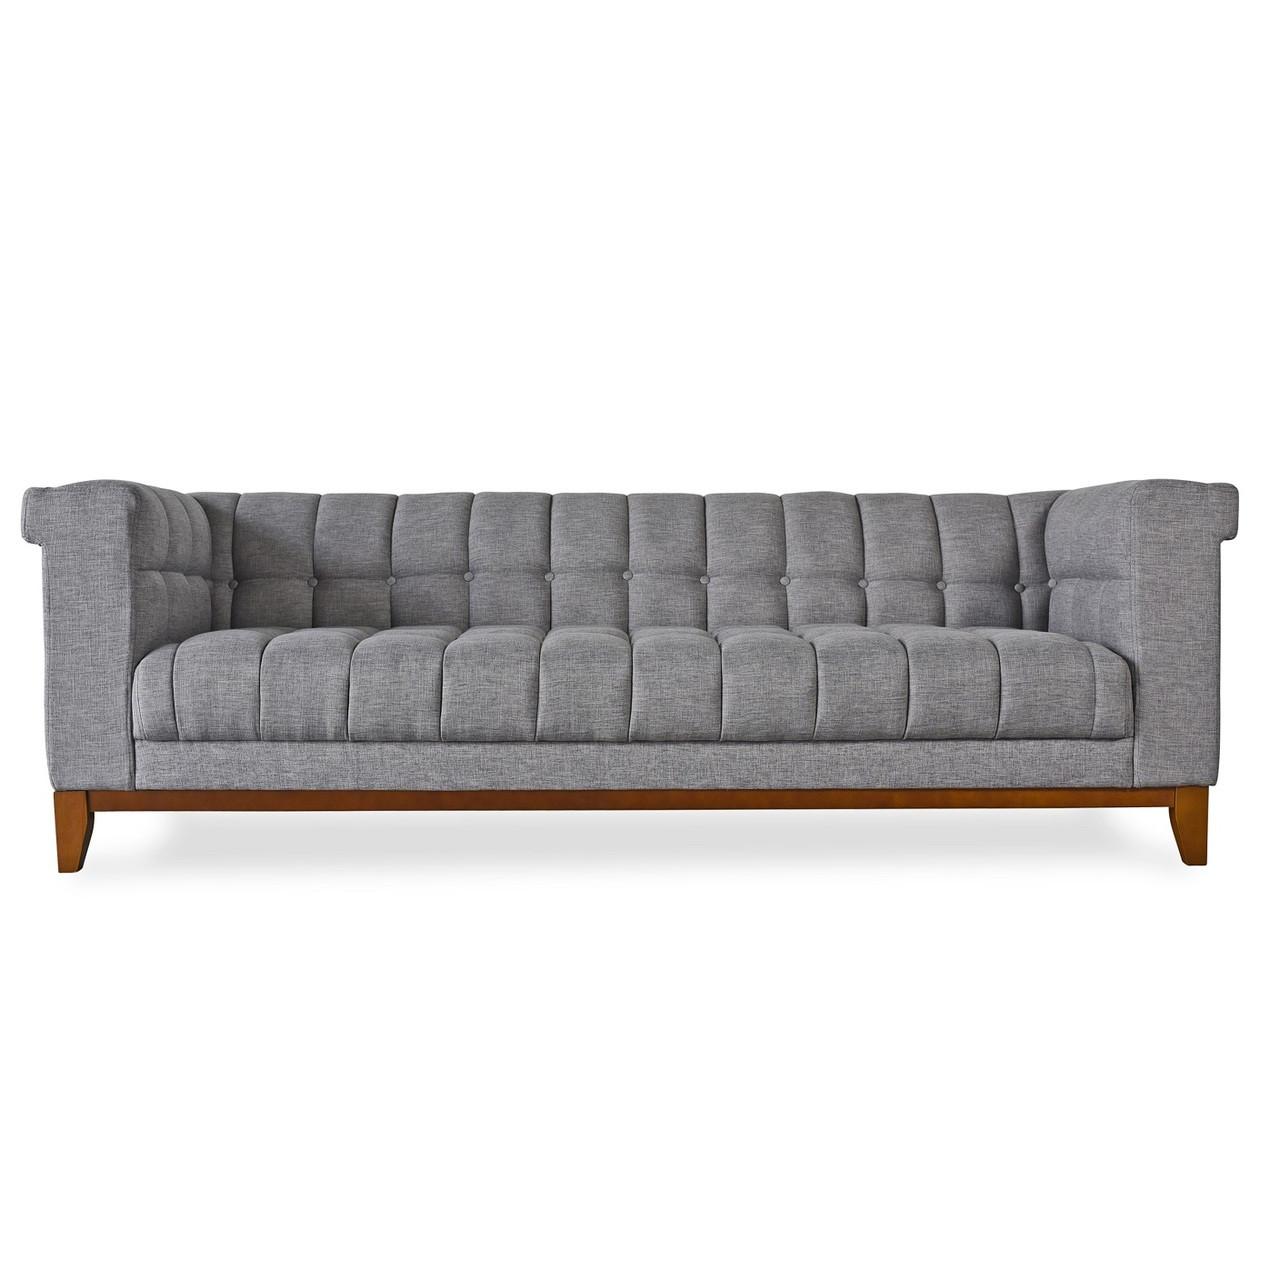 Nest Modern Grey Linen Tufted Sofa